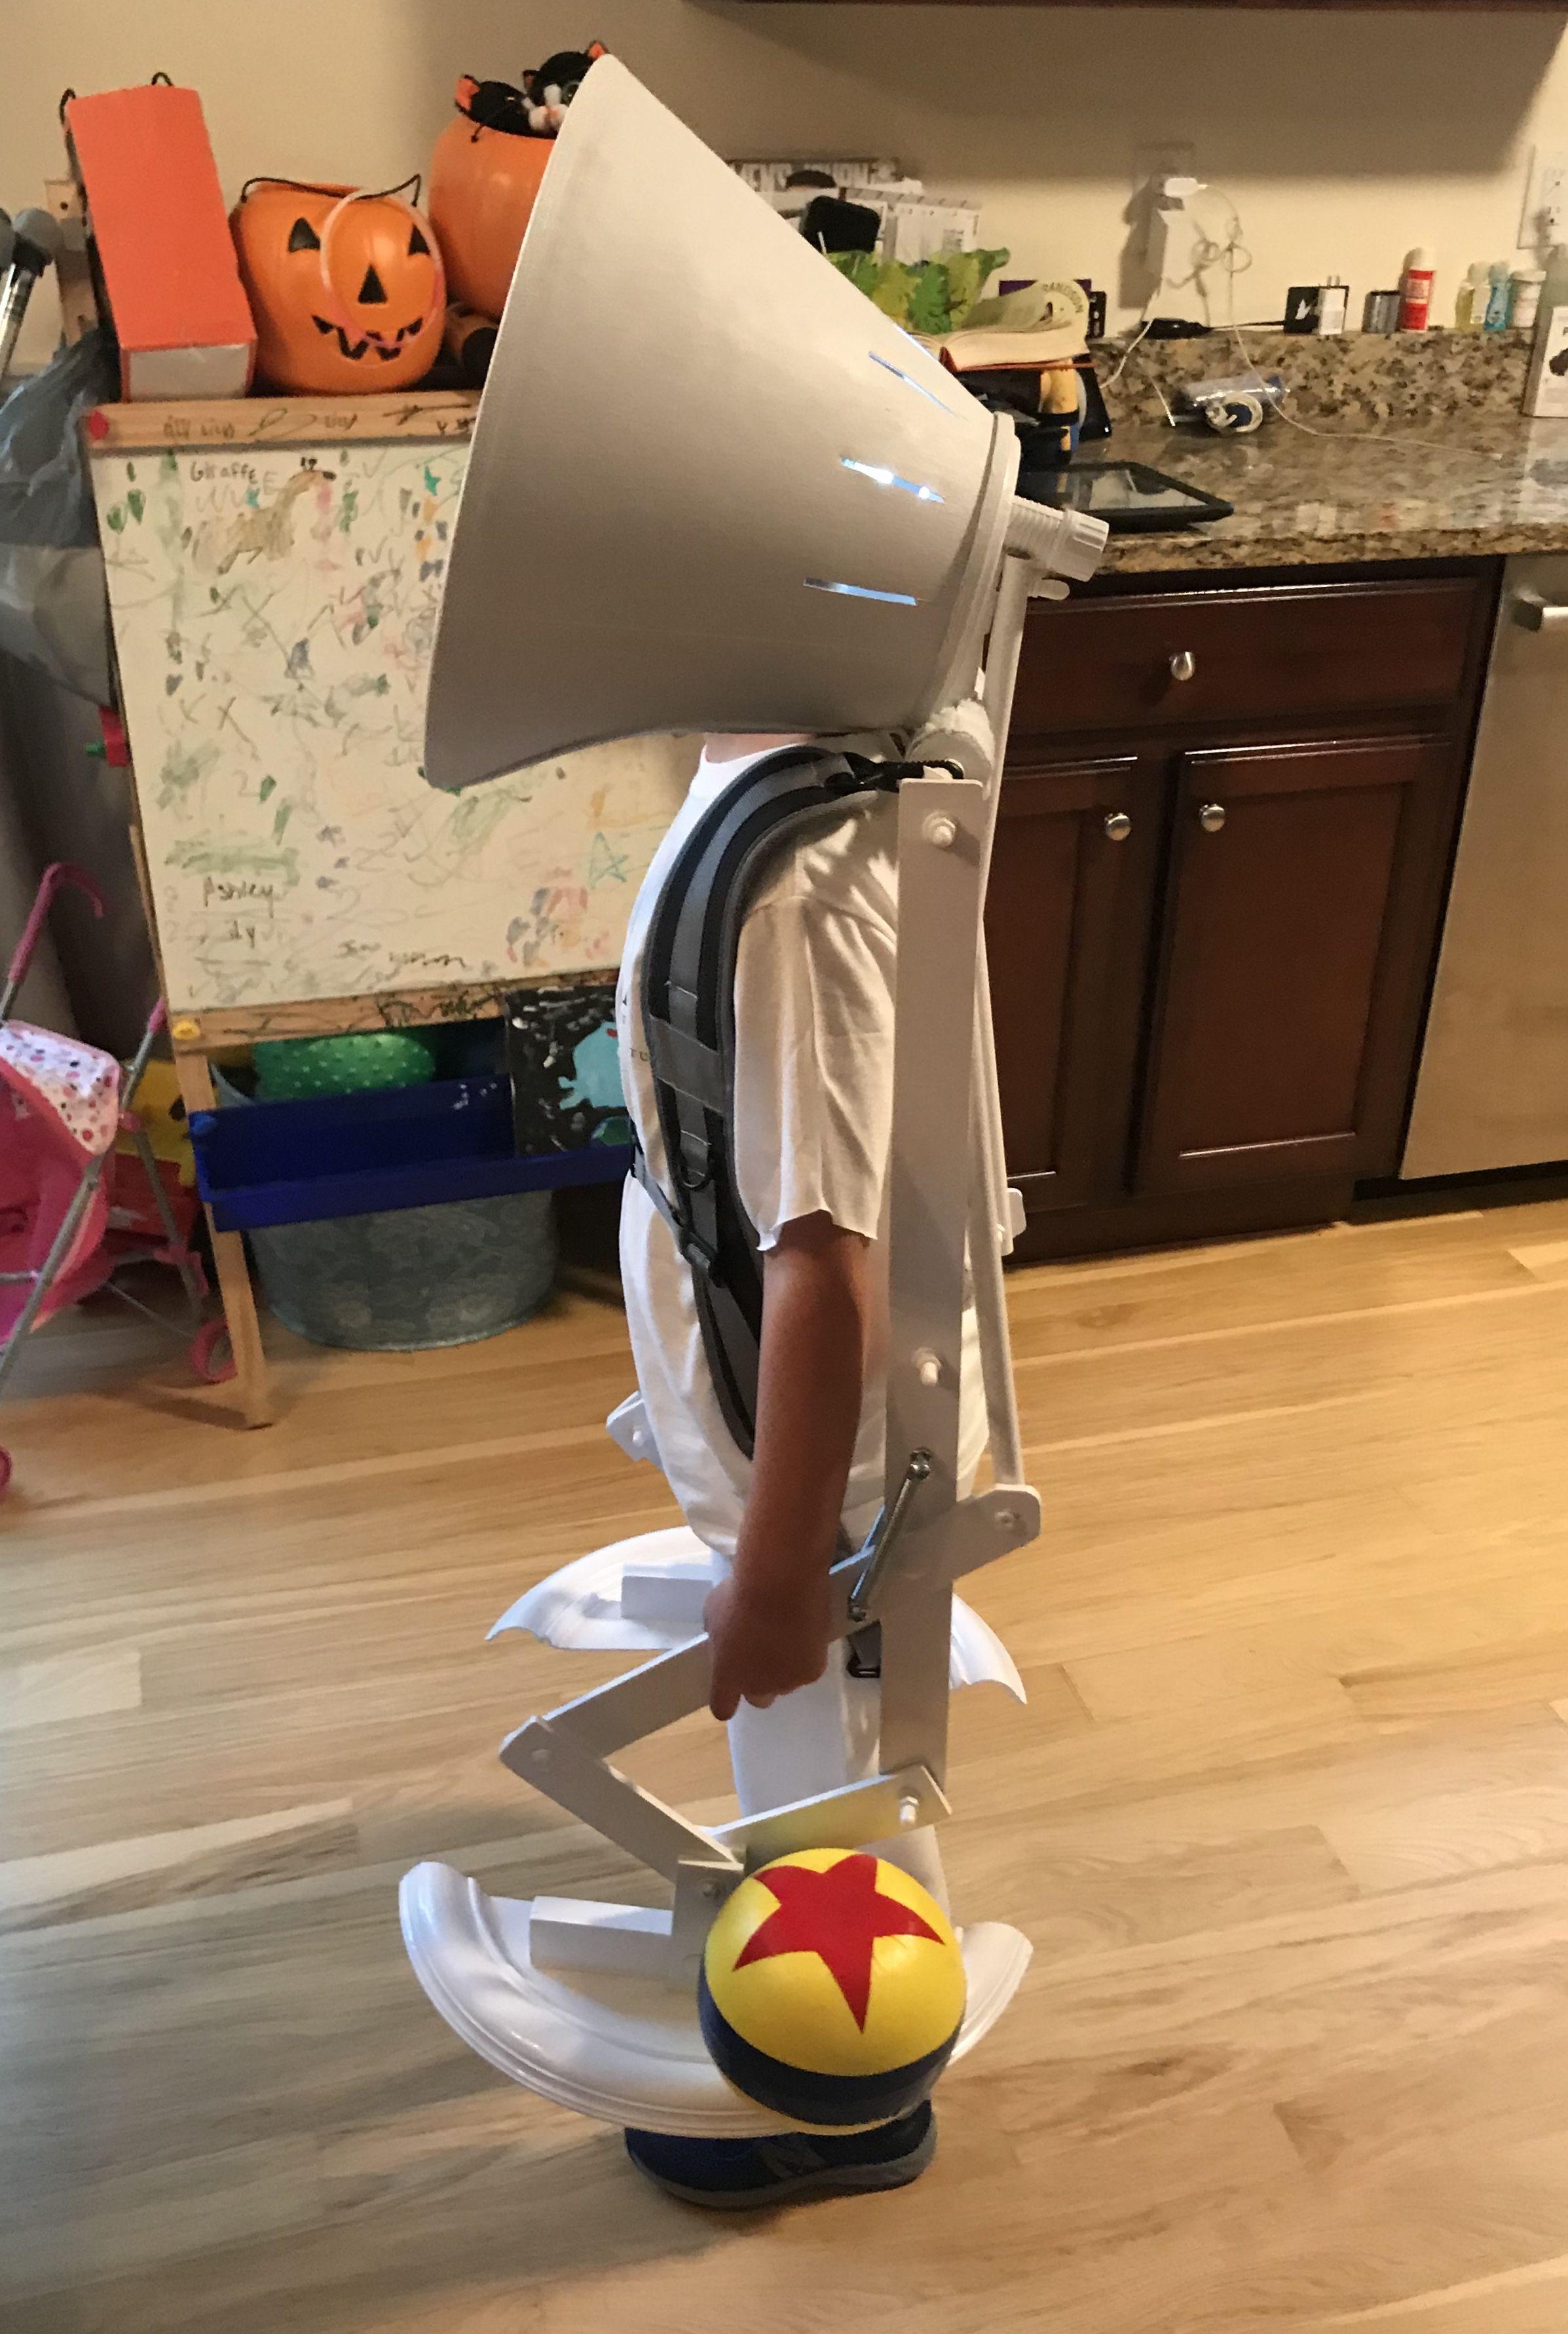 Pixar Luxo Jr Costume Pixar Lamp Pixar Costume Cool Halloween Costumes